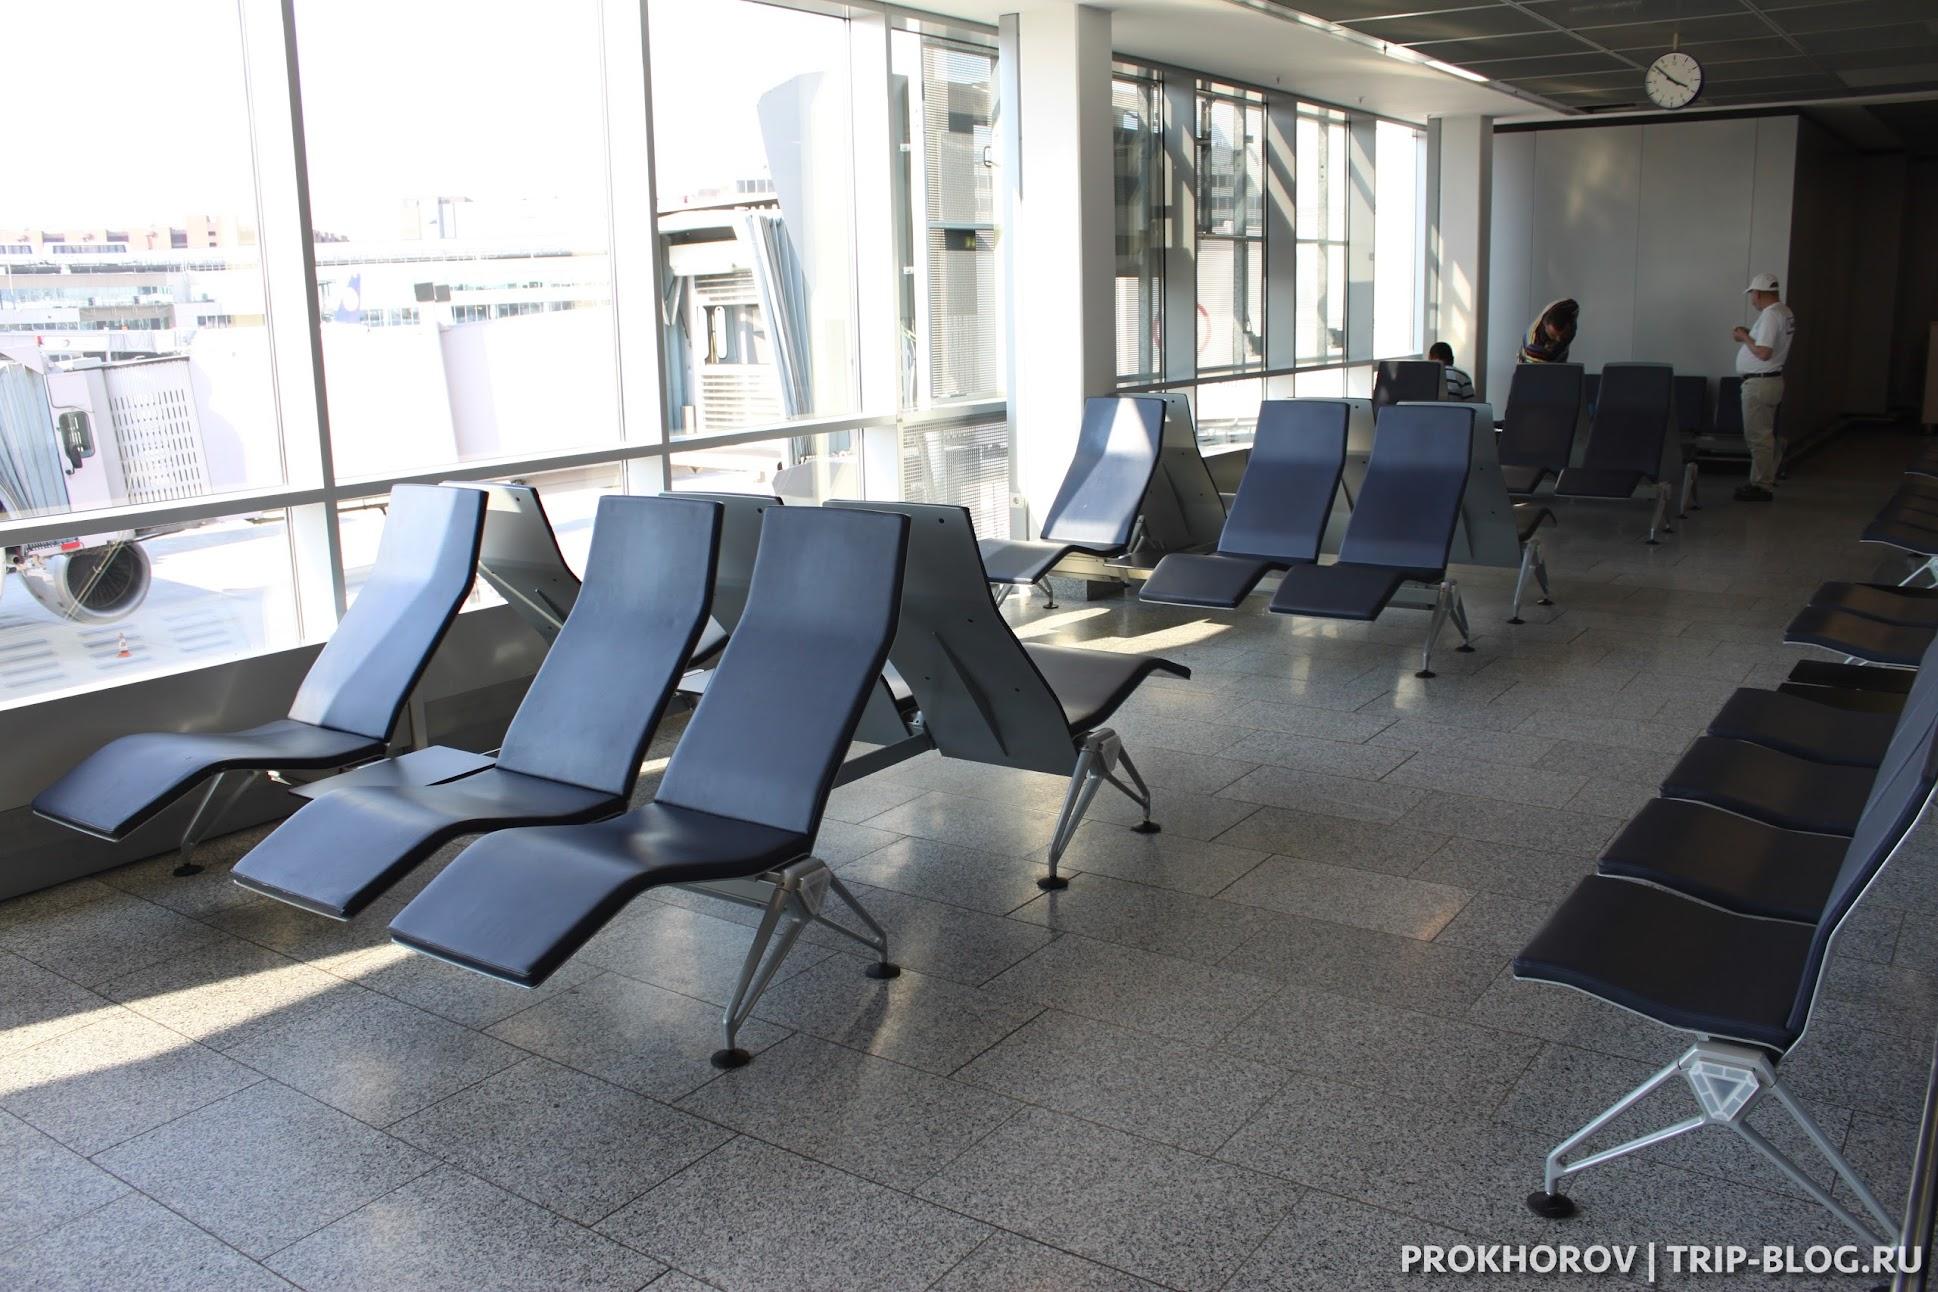 Зоны отдыха в аэропорту Франкфурта